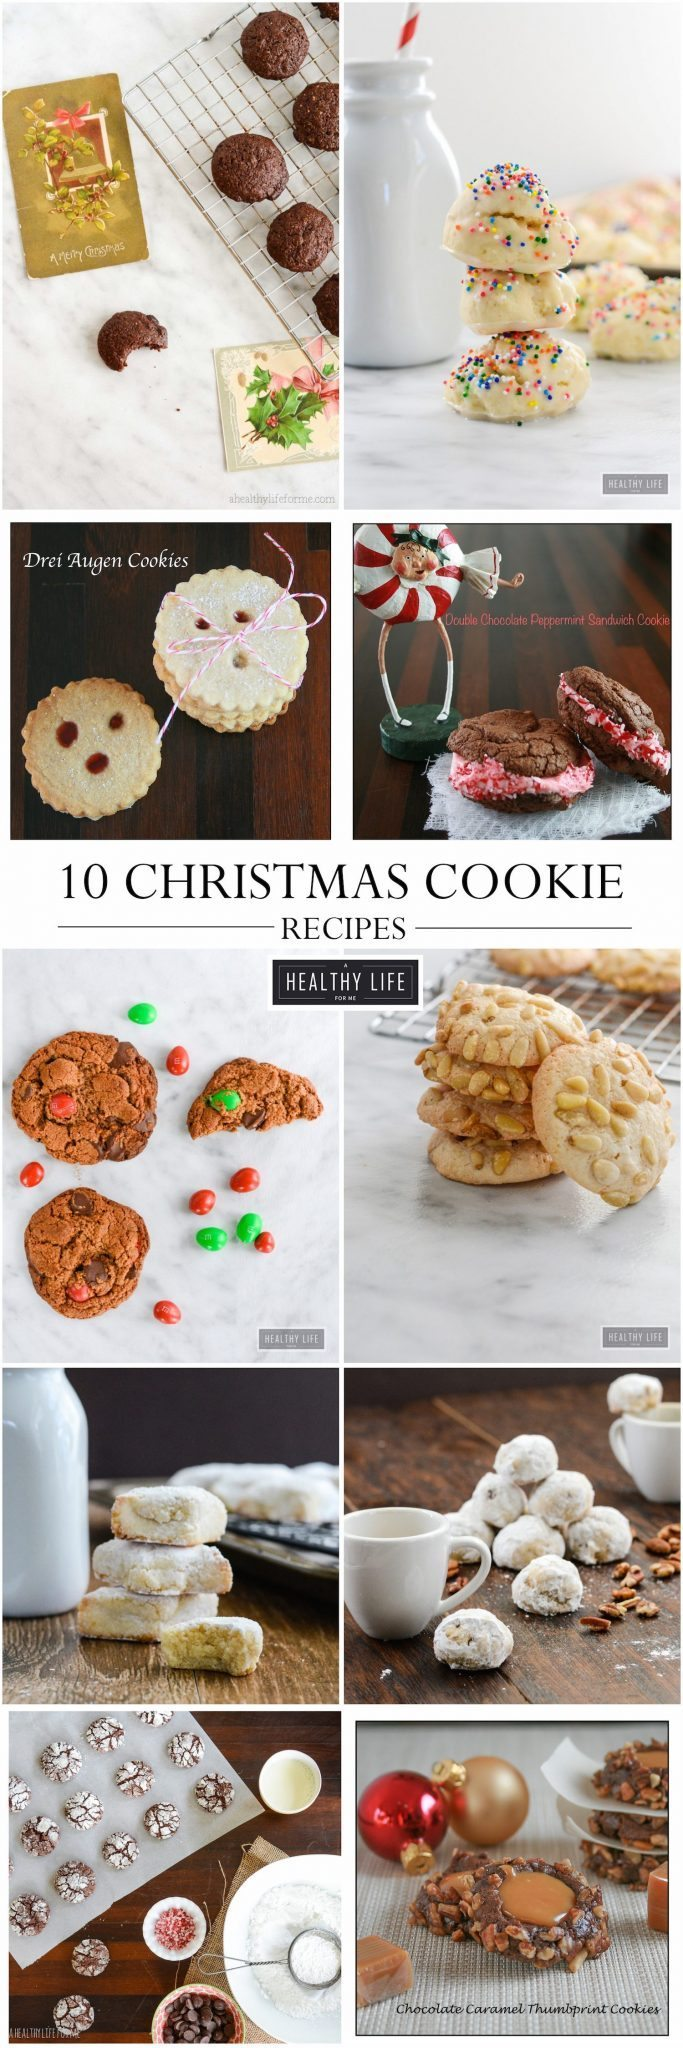 10 Christmas Cookie Recipes | ahealthylifeforme.com